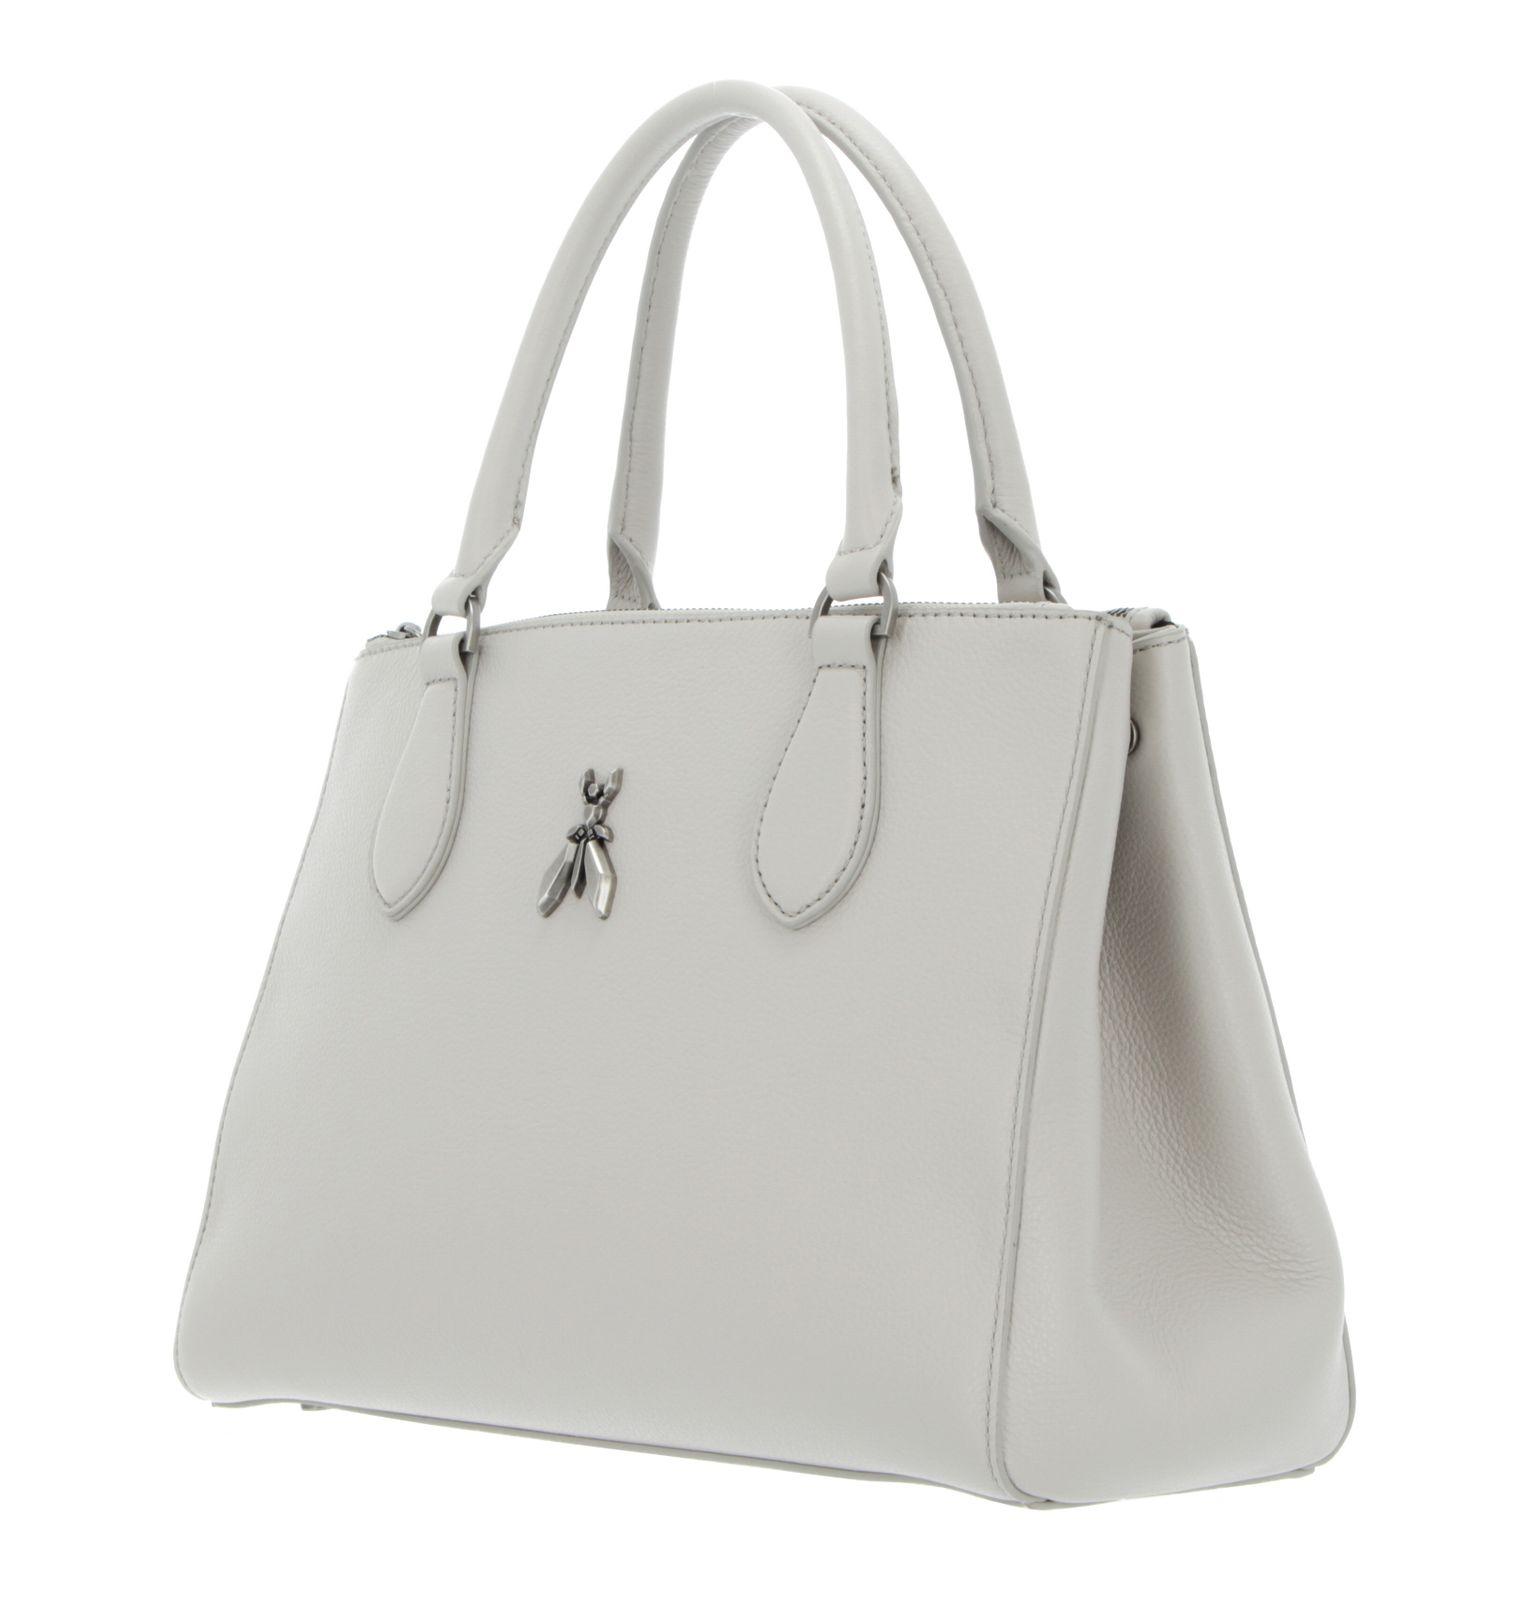 PATRIZIA PEPE Handbag Ice Grey